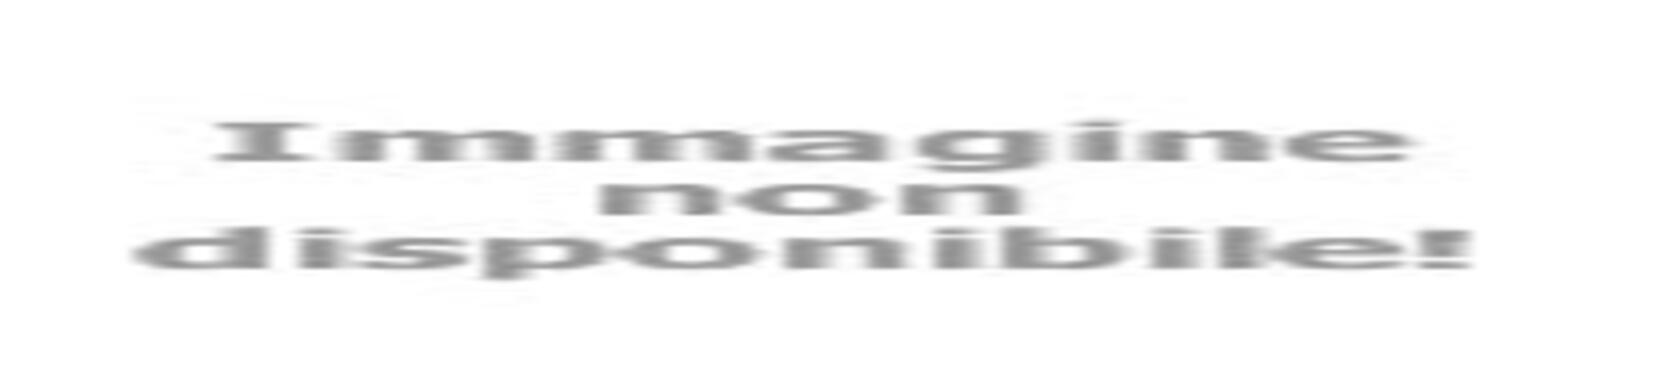 basketriminicrabs it 6-2701-video-eybl-u20-playoff-crabs-vs-nba-africa 003